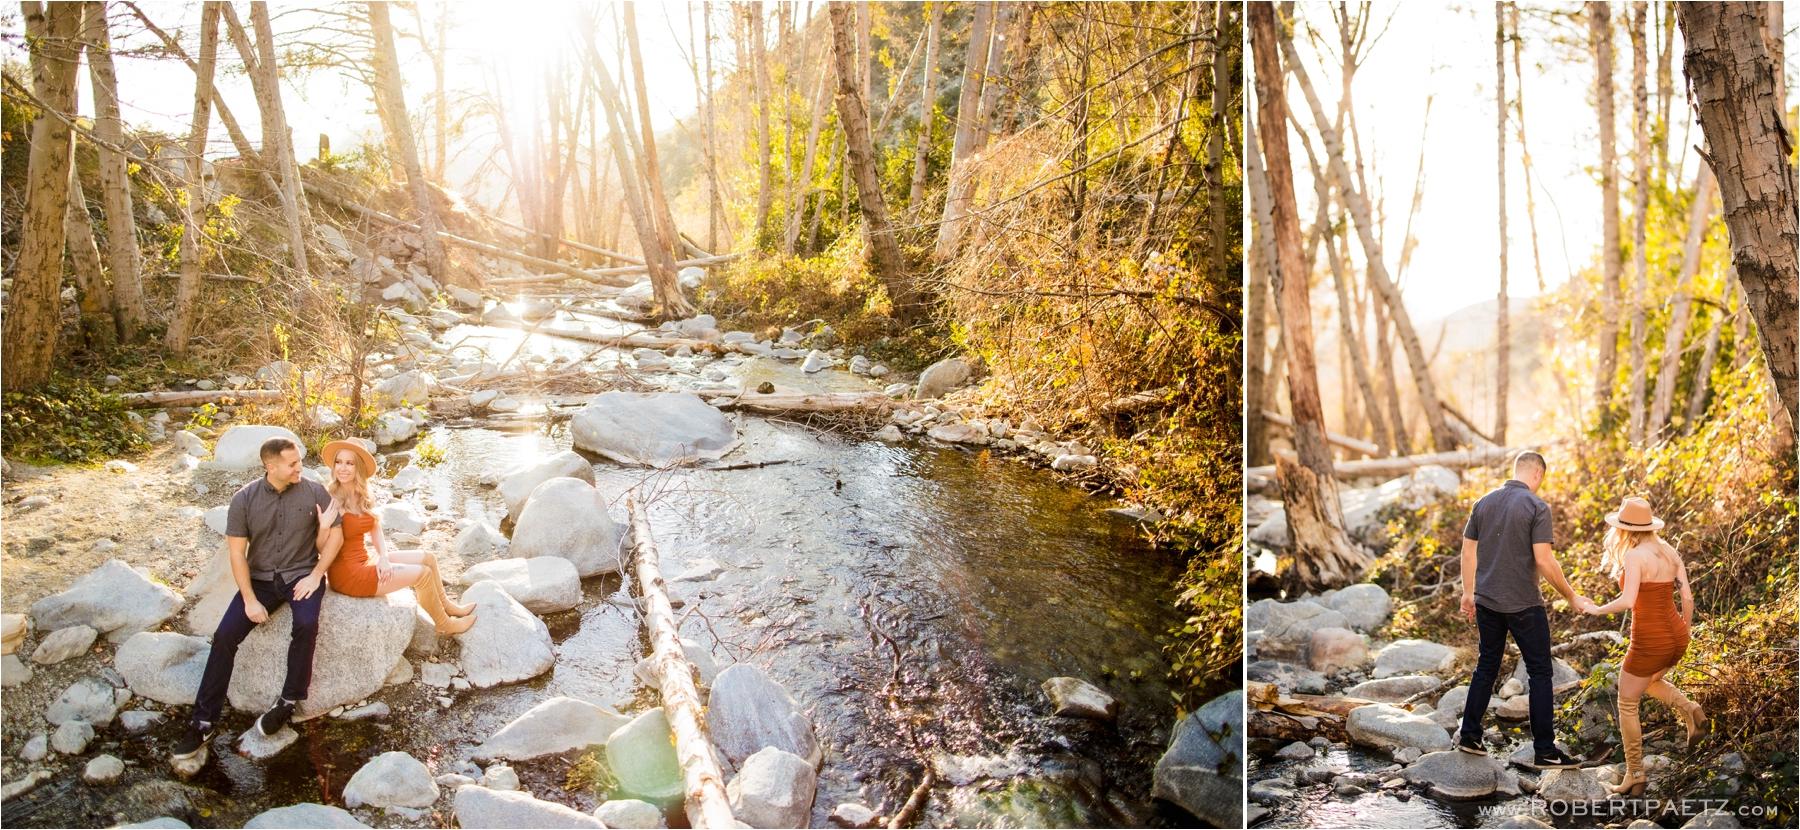 engagement, photography, photographer, los, angeles, mt, mount, baldy, mountain, sunset